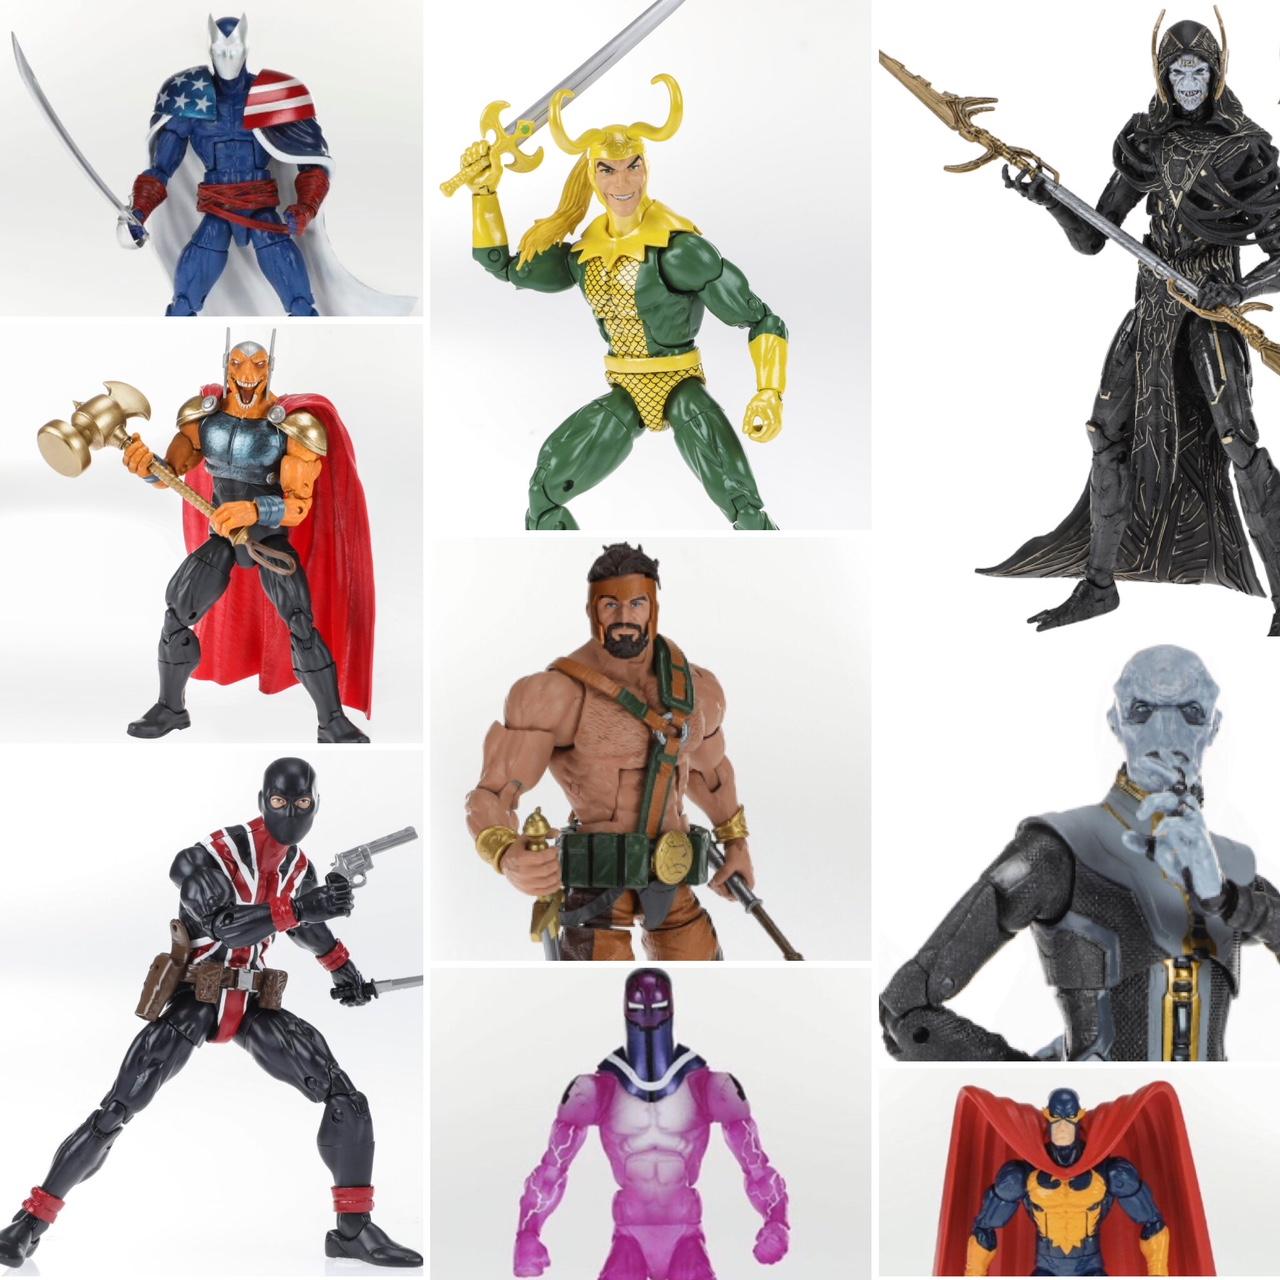 Thanos Iron Spider Man Marvel Legends BAF Series Avengers Best of Wave Figure